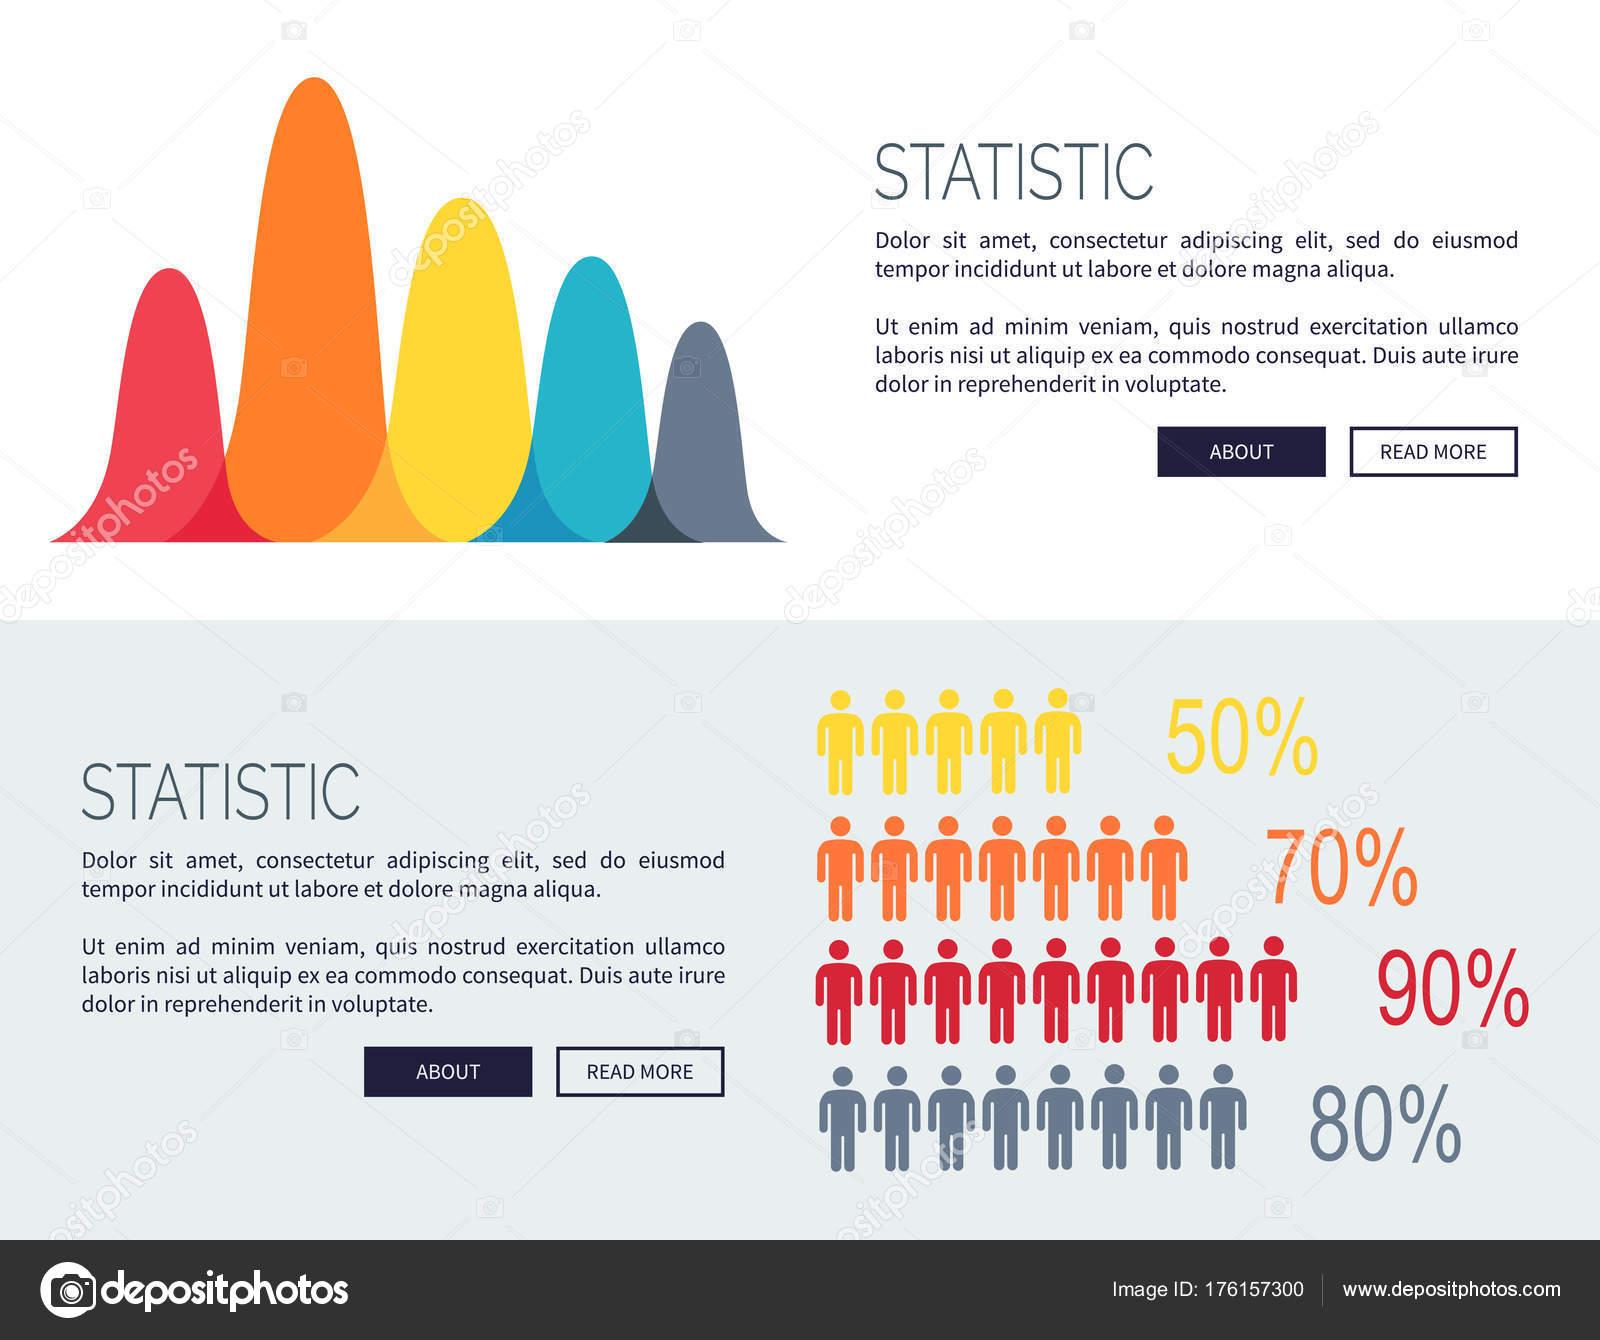 Statistick Grafy S Rostouc Diagramy A Lid Stock Vektor Siluety Znaky Procenta Vektorov Webov Plakty Textem Pro Analytics Od